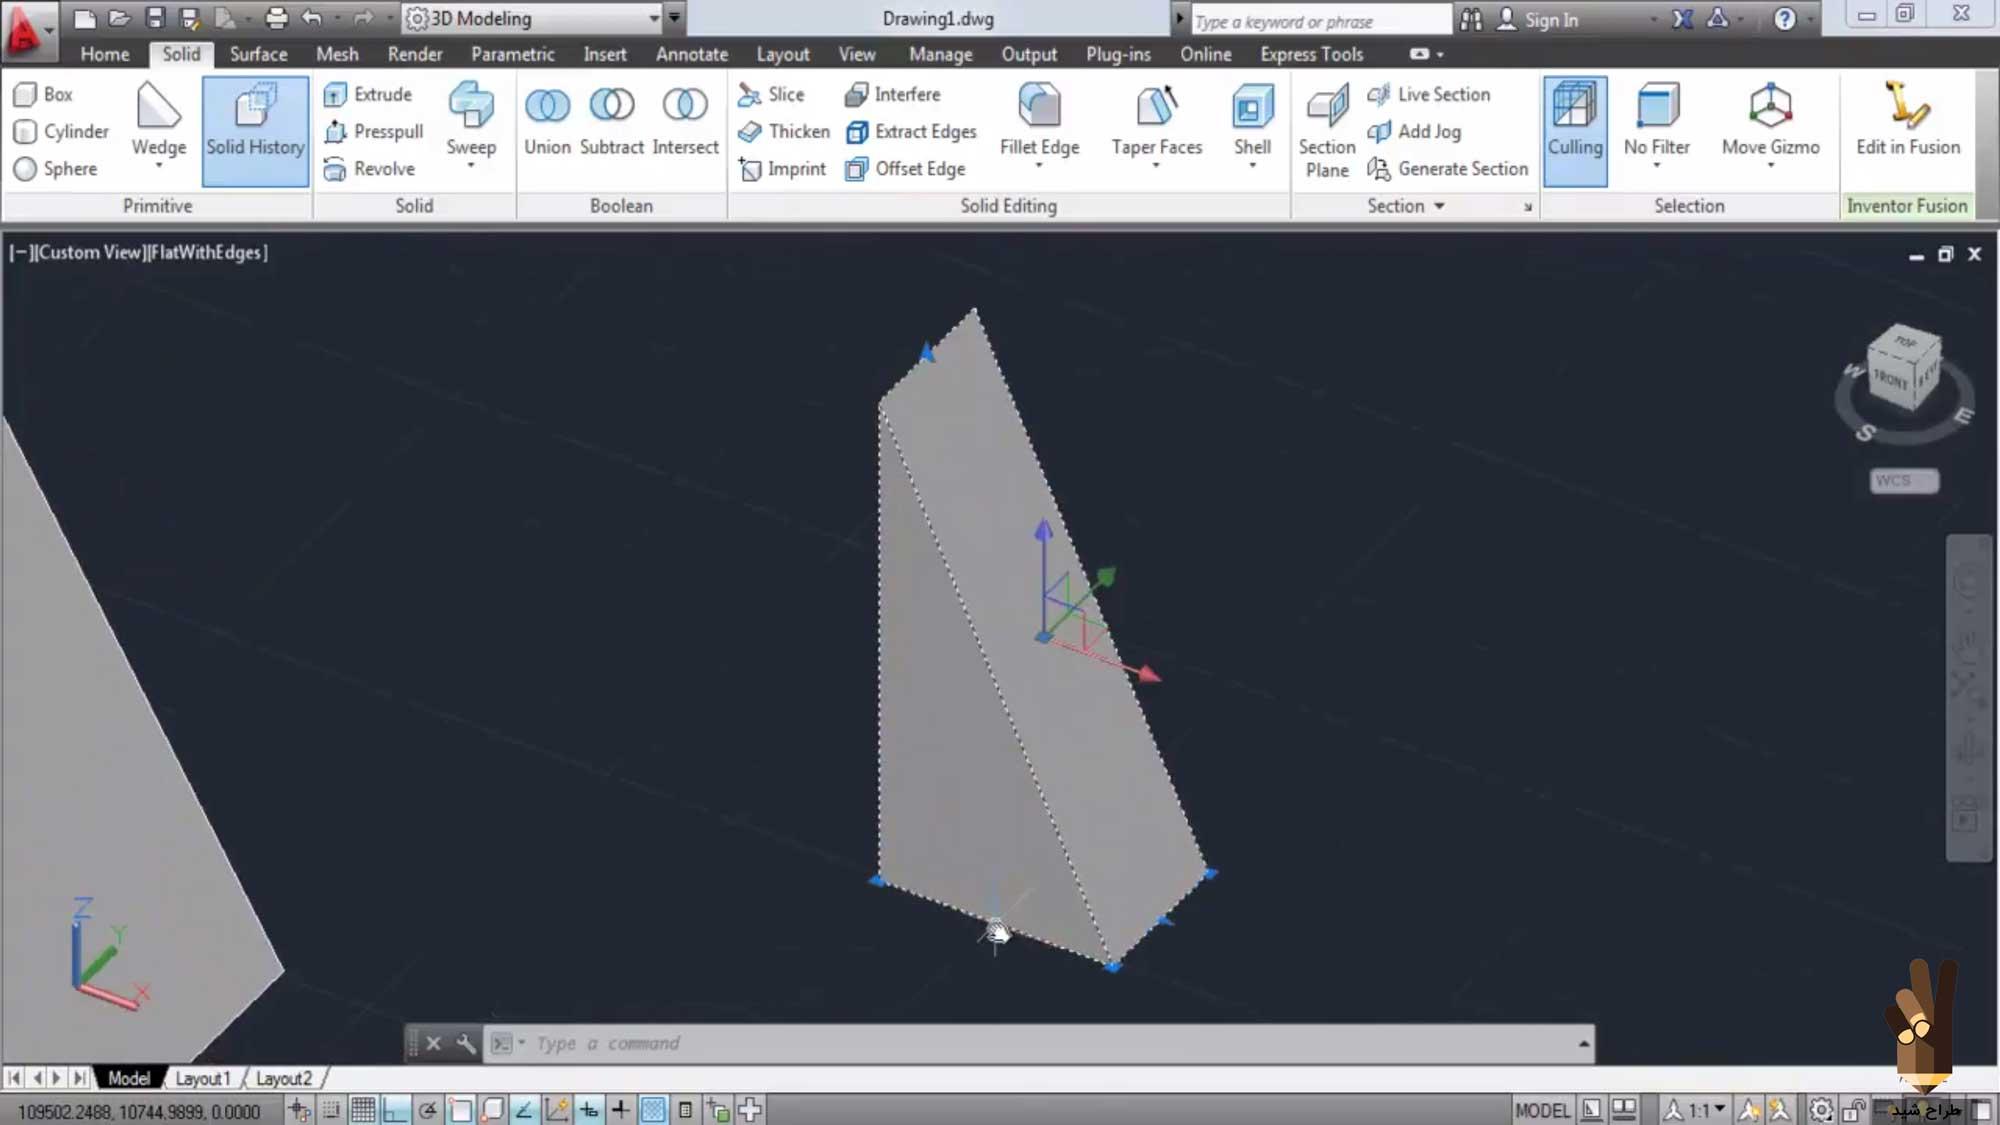 رسم مثلث سه بعدی در اتوکد 5